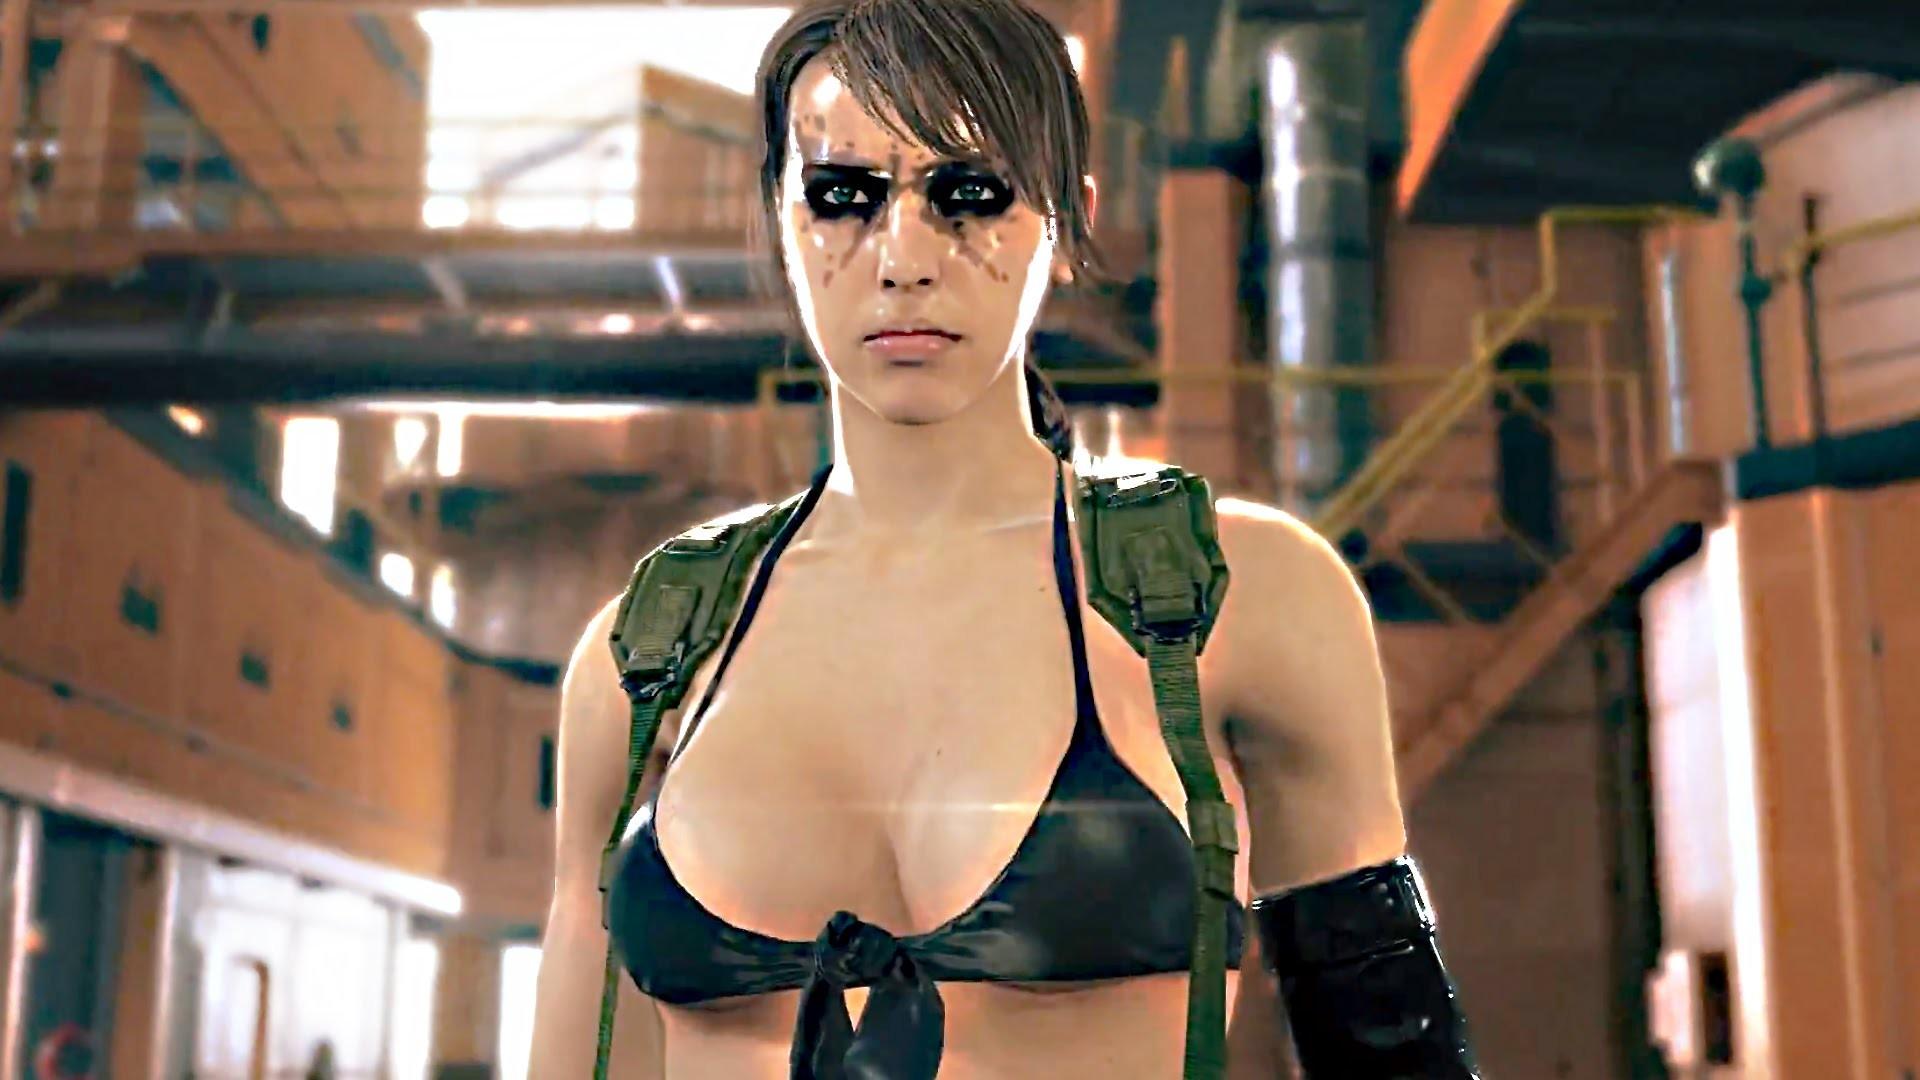 Metal Gear Solid 5 Phantom Pain 60 FPS Quiet Trailer – English – YouTube